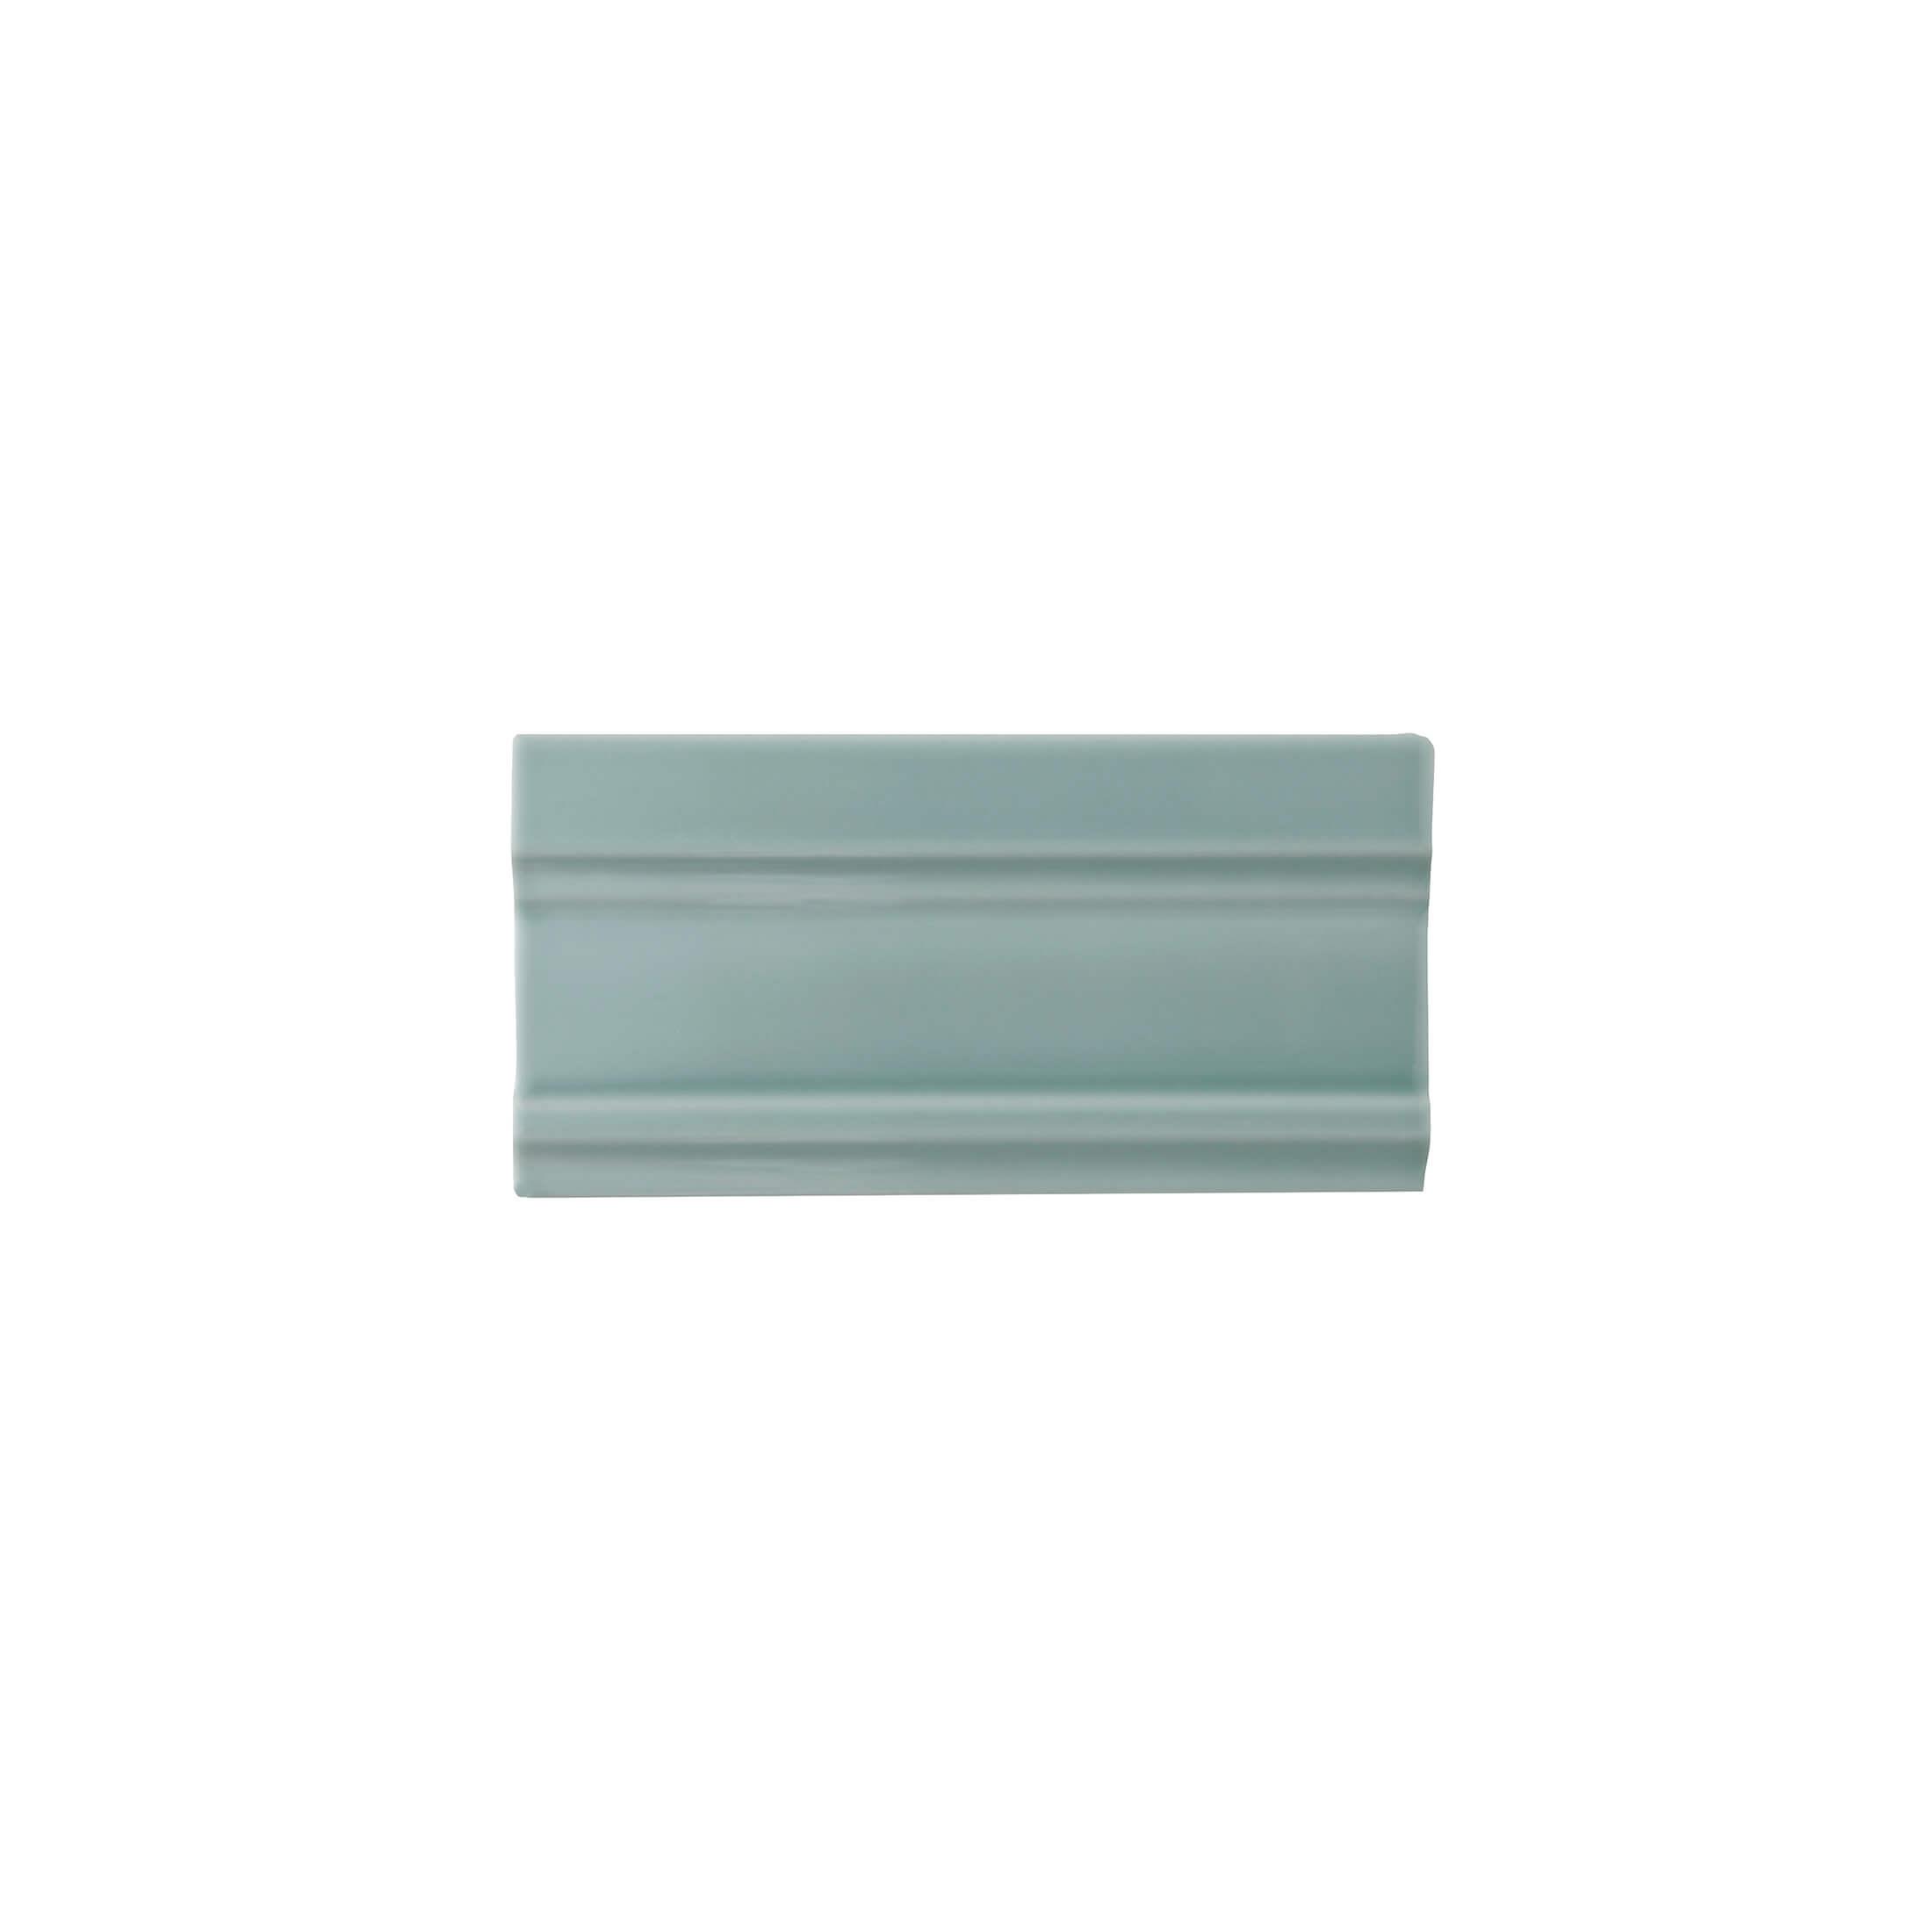 ADNE5628 - CORNISA CLASICA - 7.5 cm X 15 cm